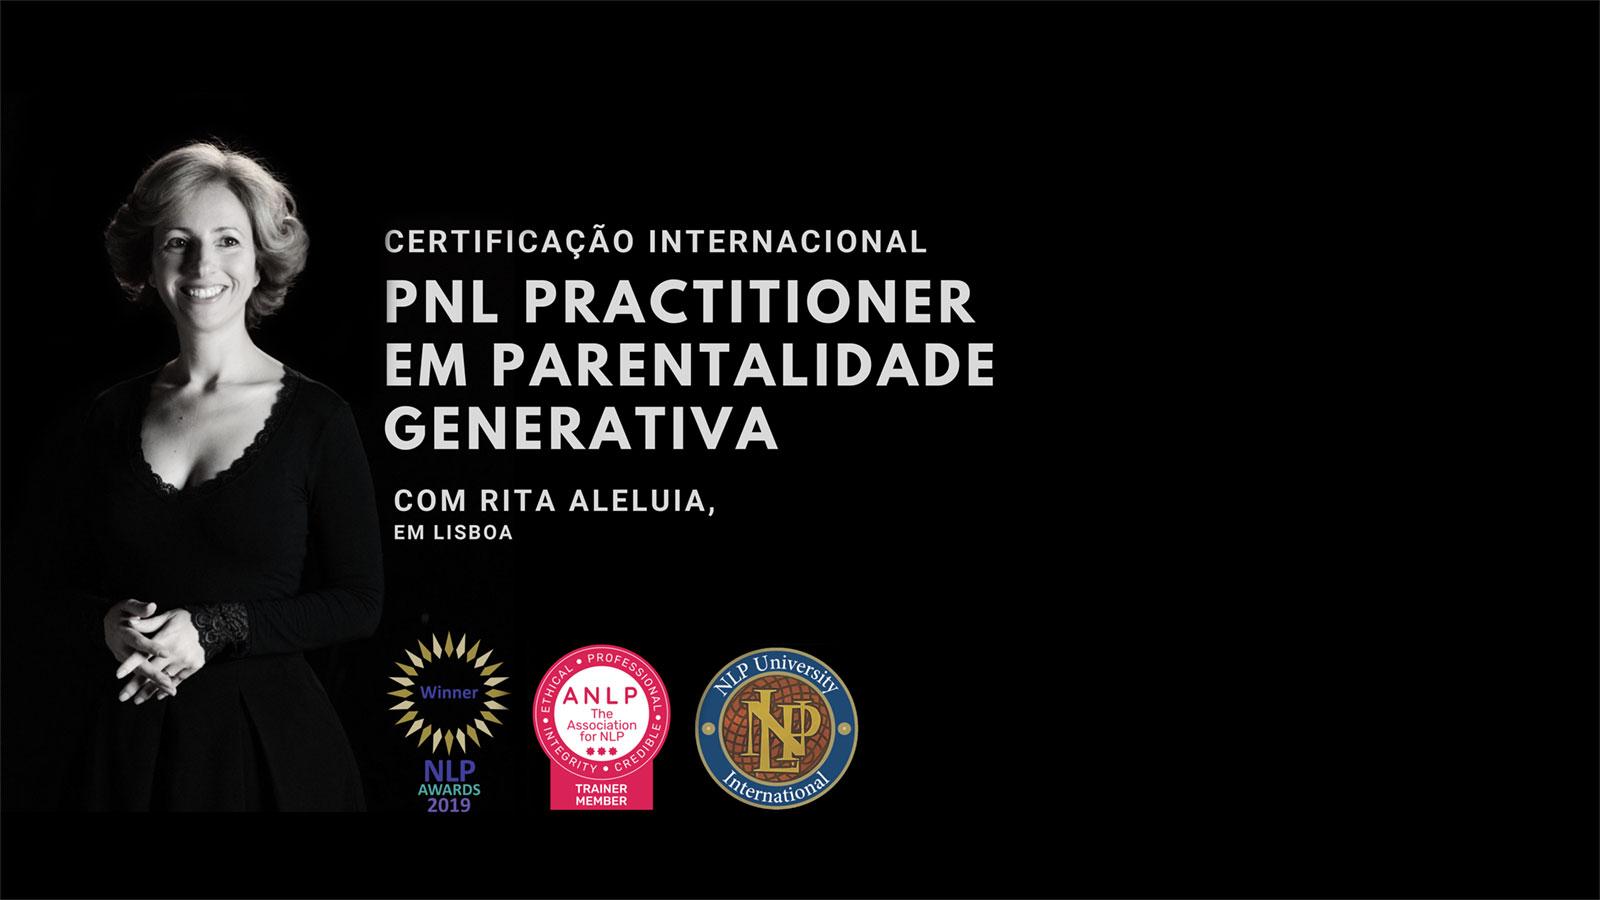 Practitioner em Parentalidade Generativa, Lisboa